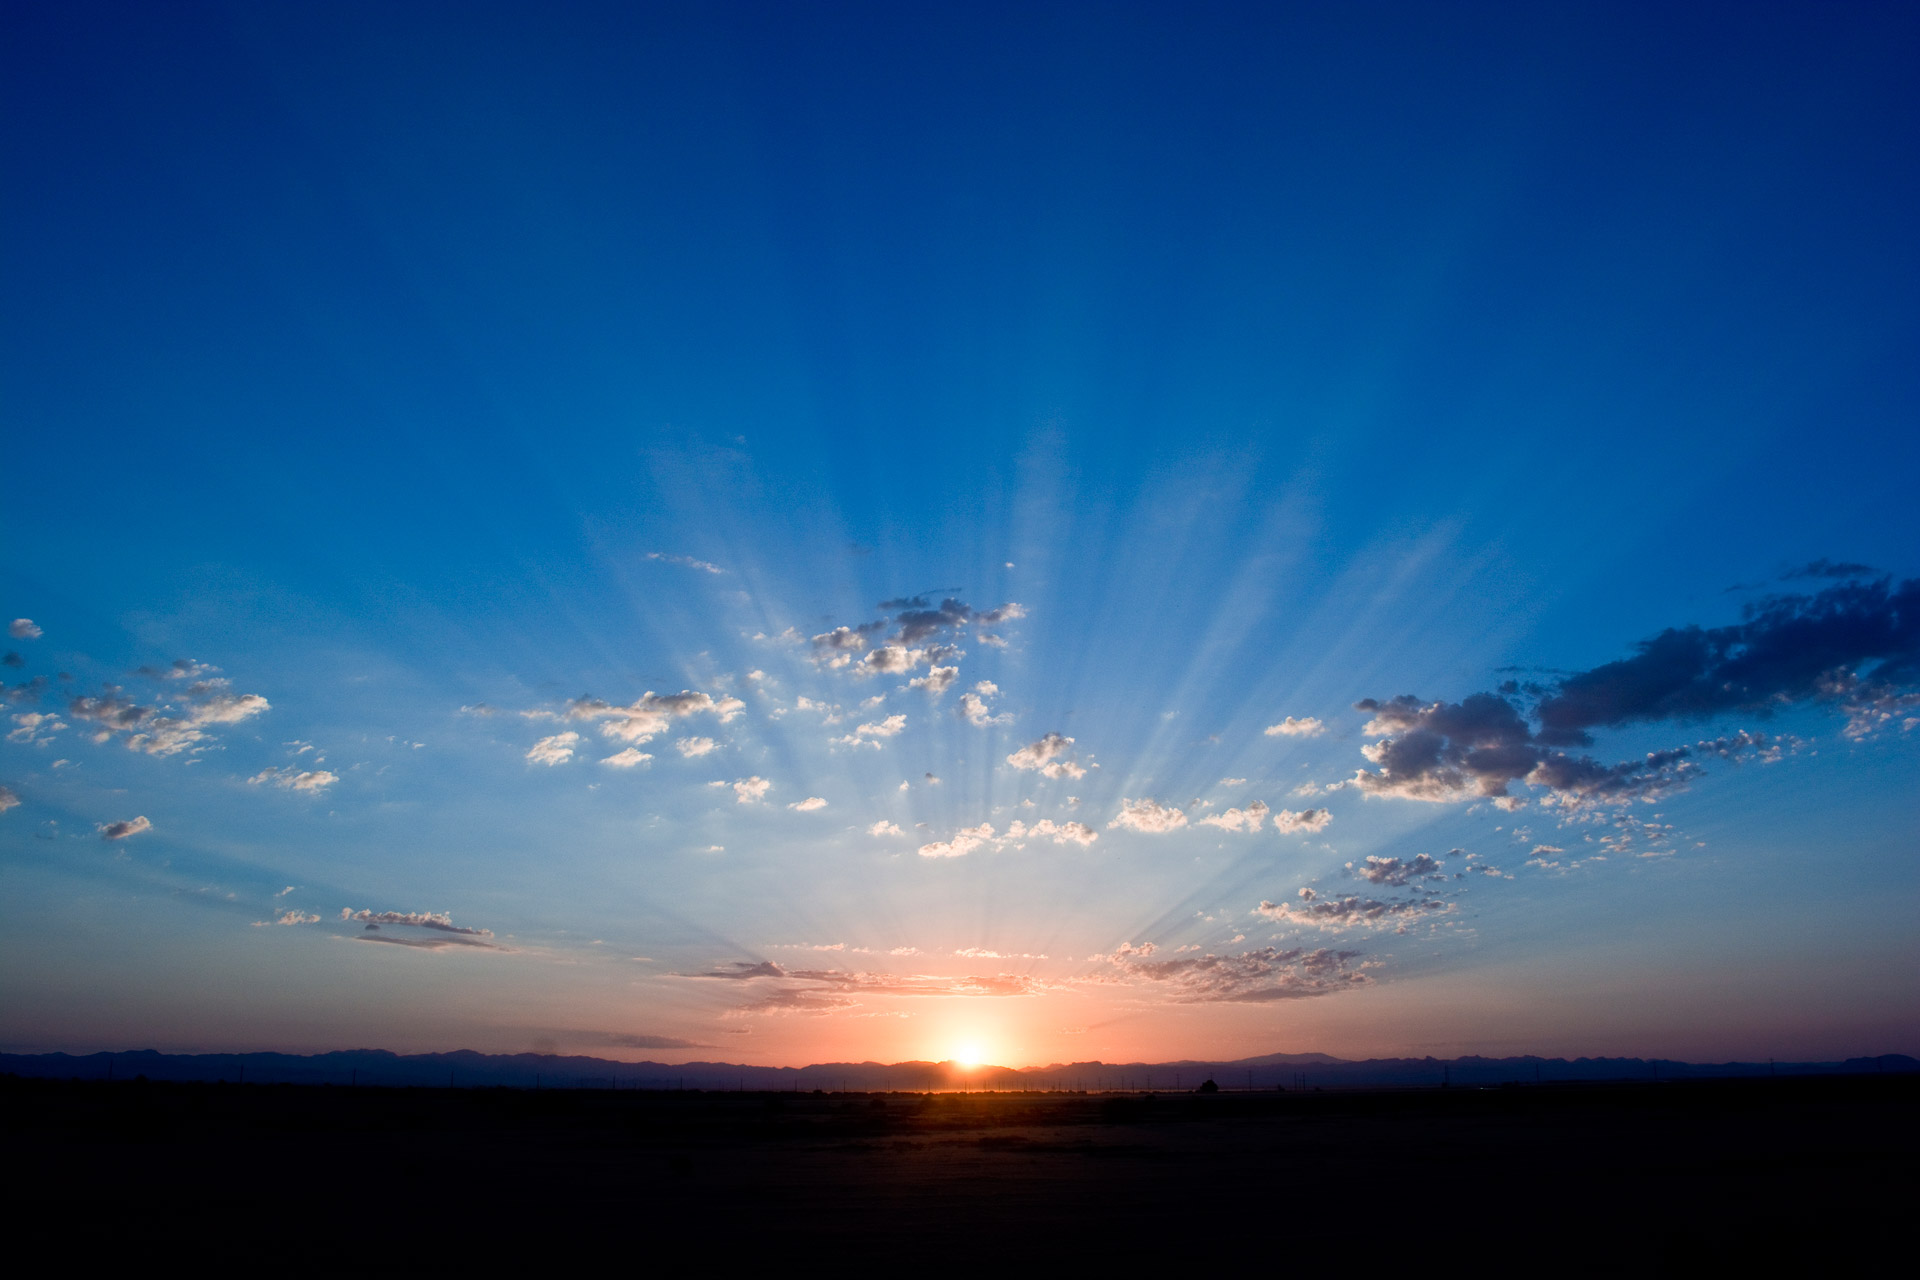 Sunrise Free Stock Photo - Public Domain Pictures